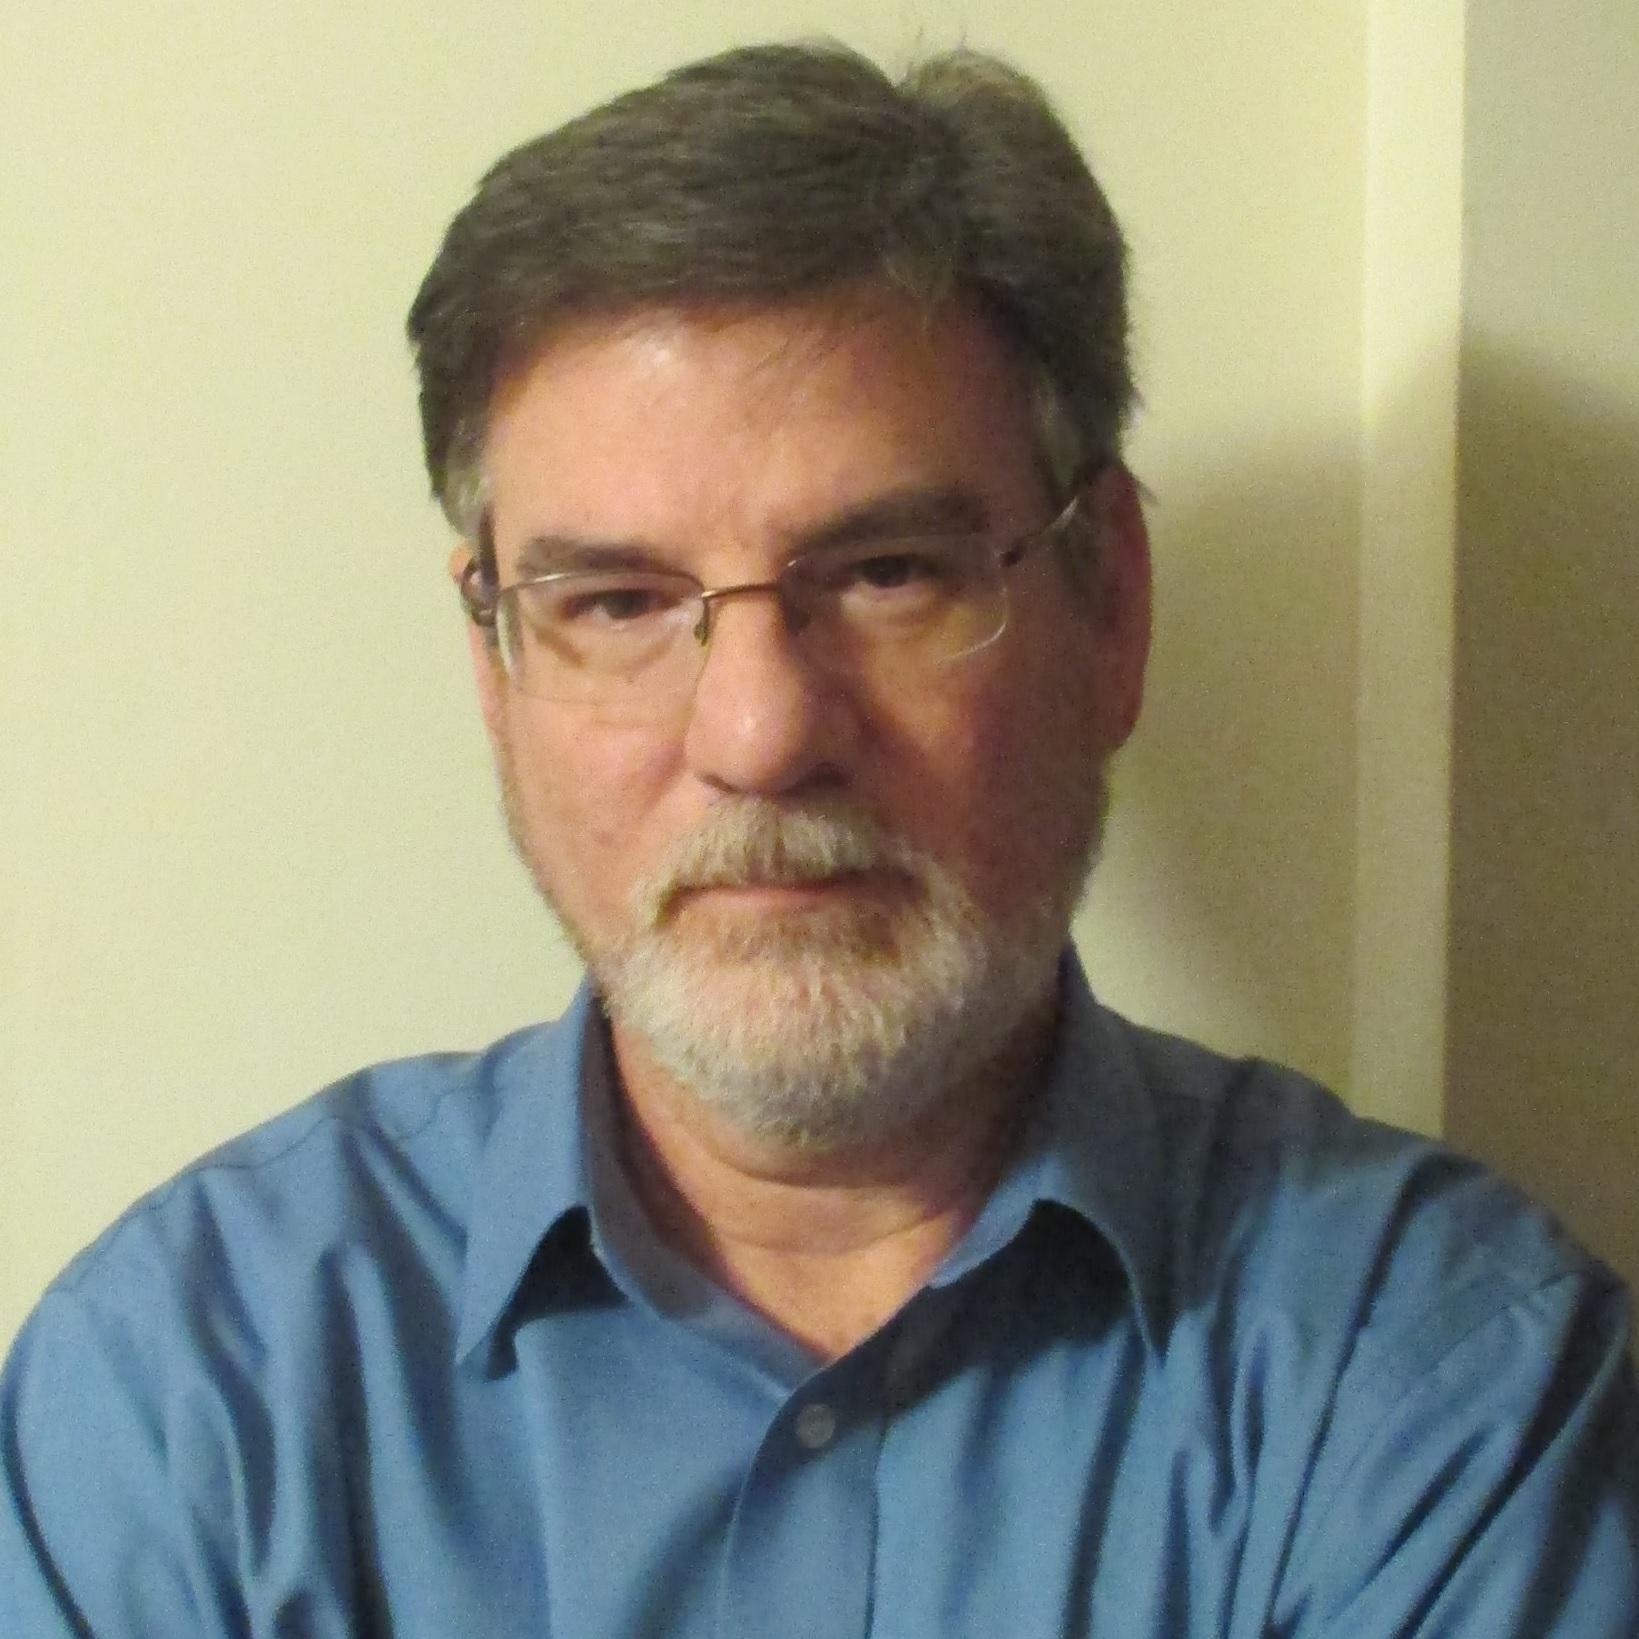 William Rayst